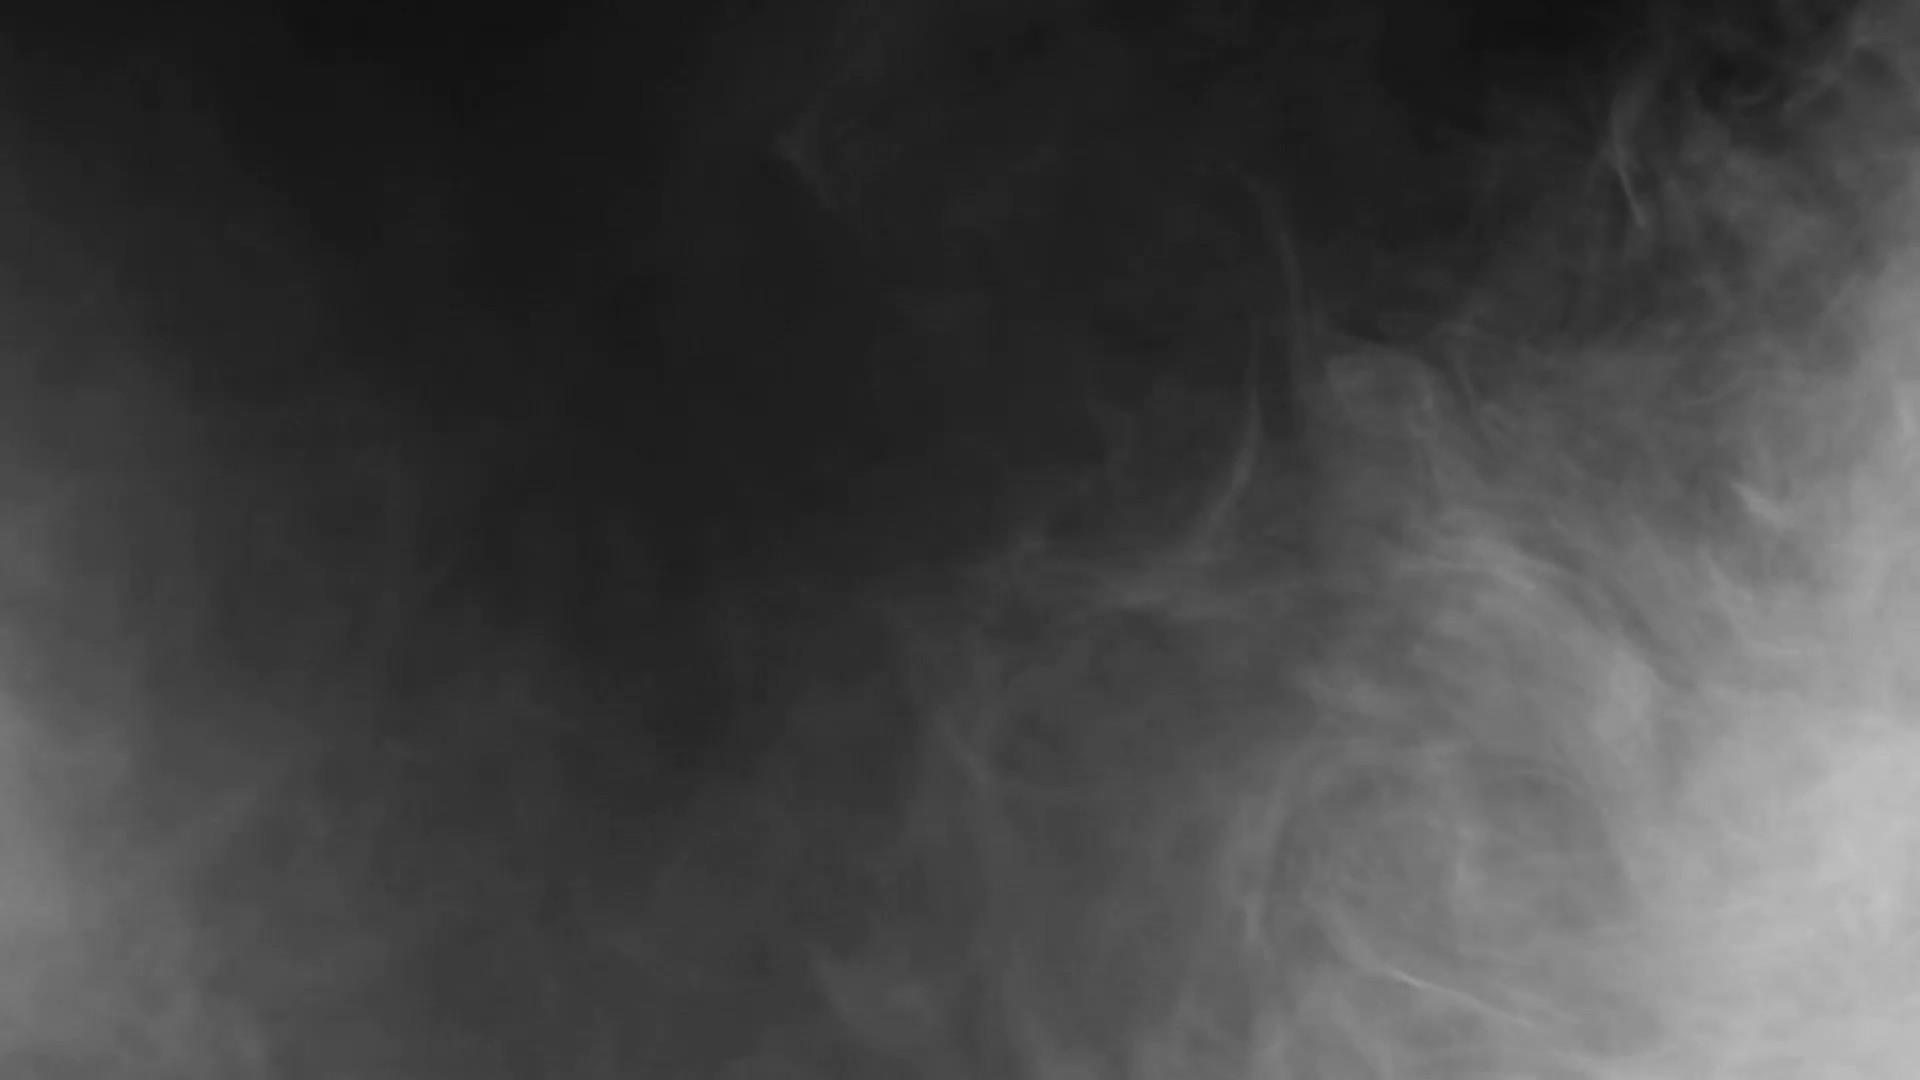 Abstract smoke on black background. Smoke cloud in slow motion. Smoke